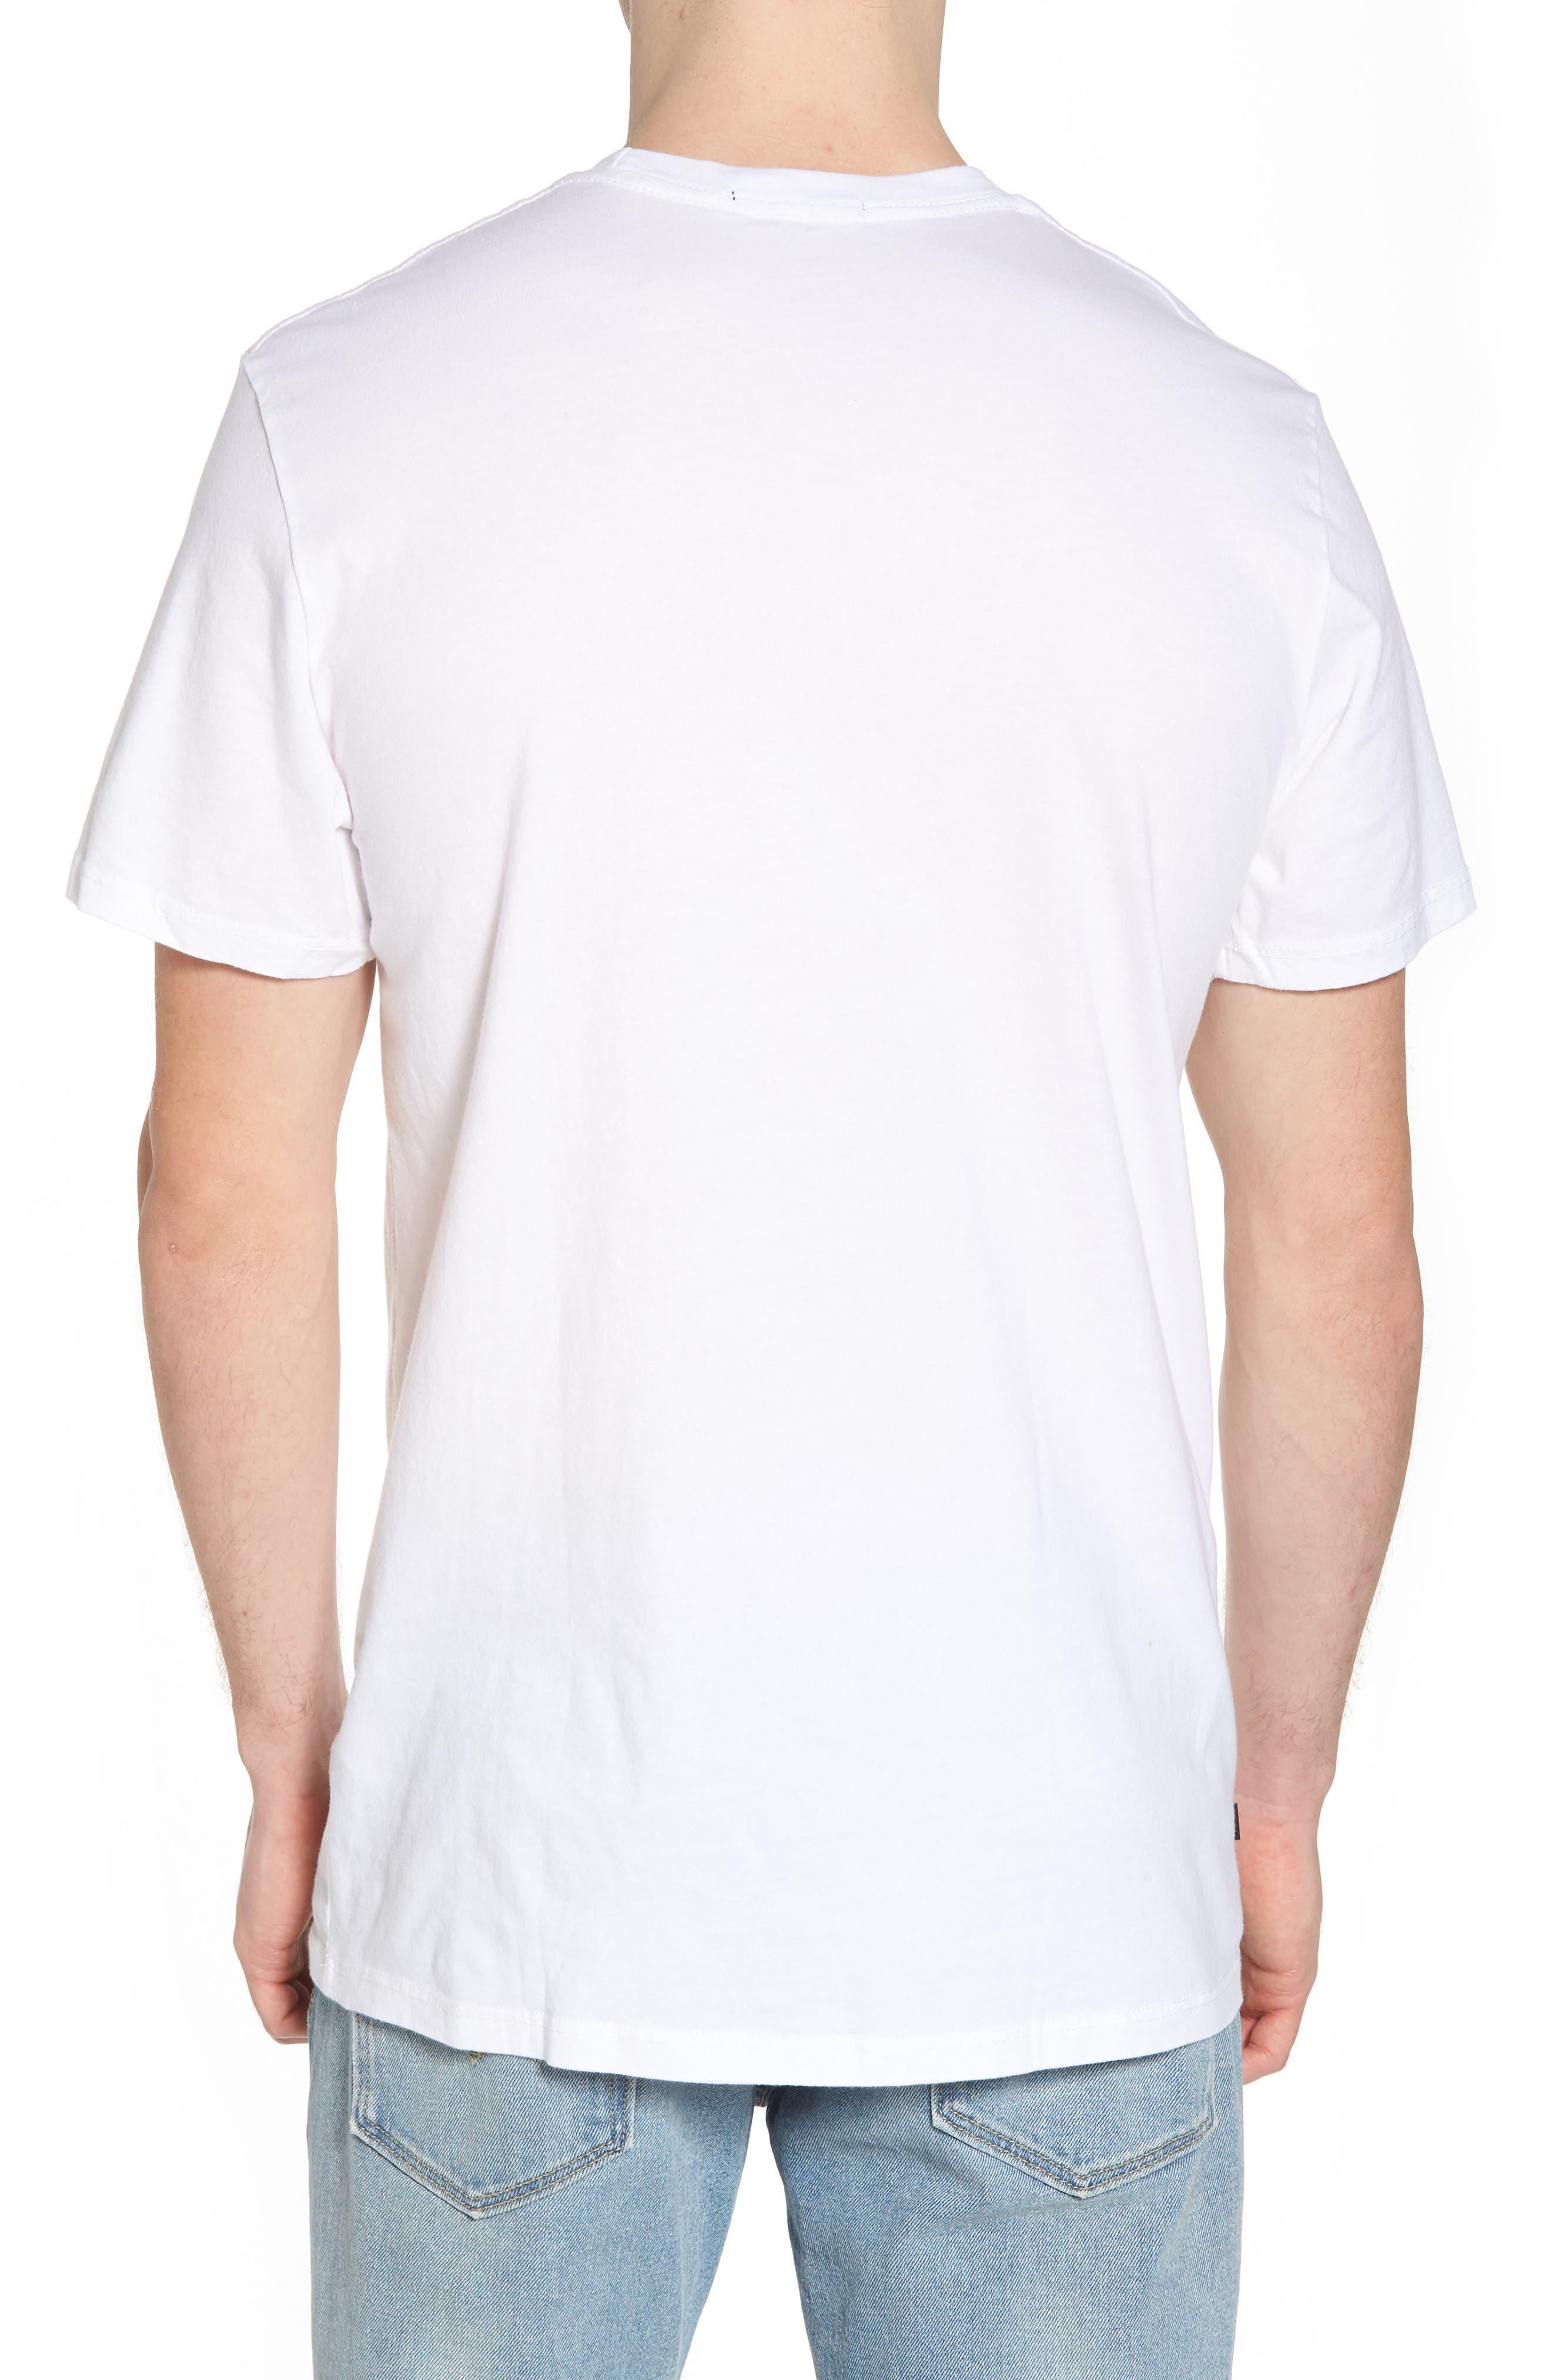 Radioactive Graphic T-Shirt,                             Alternate thumbnail 2, color,                             White